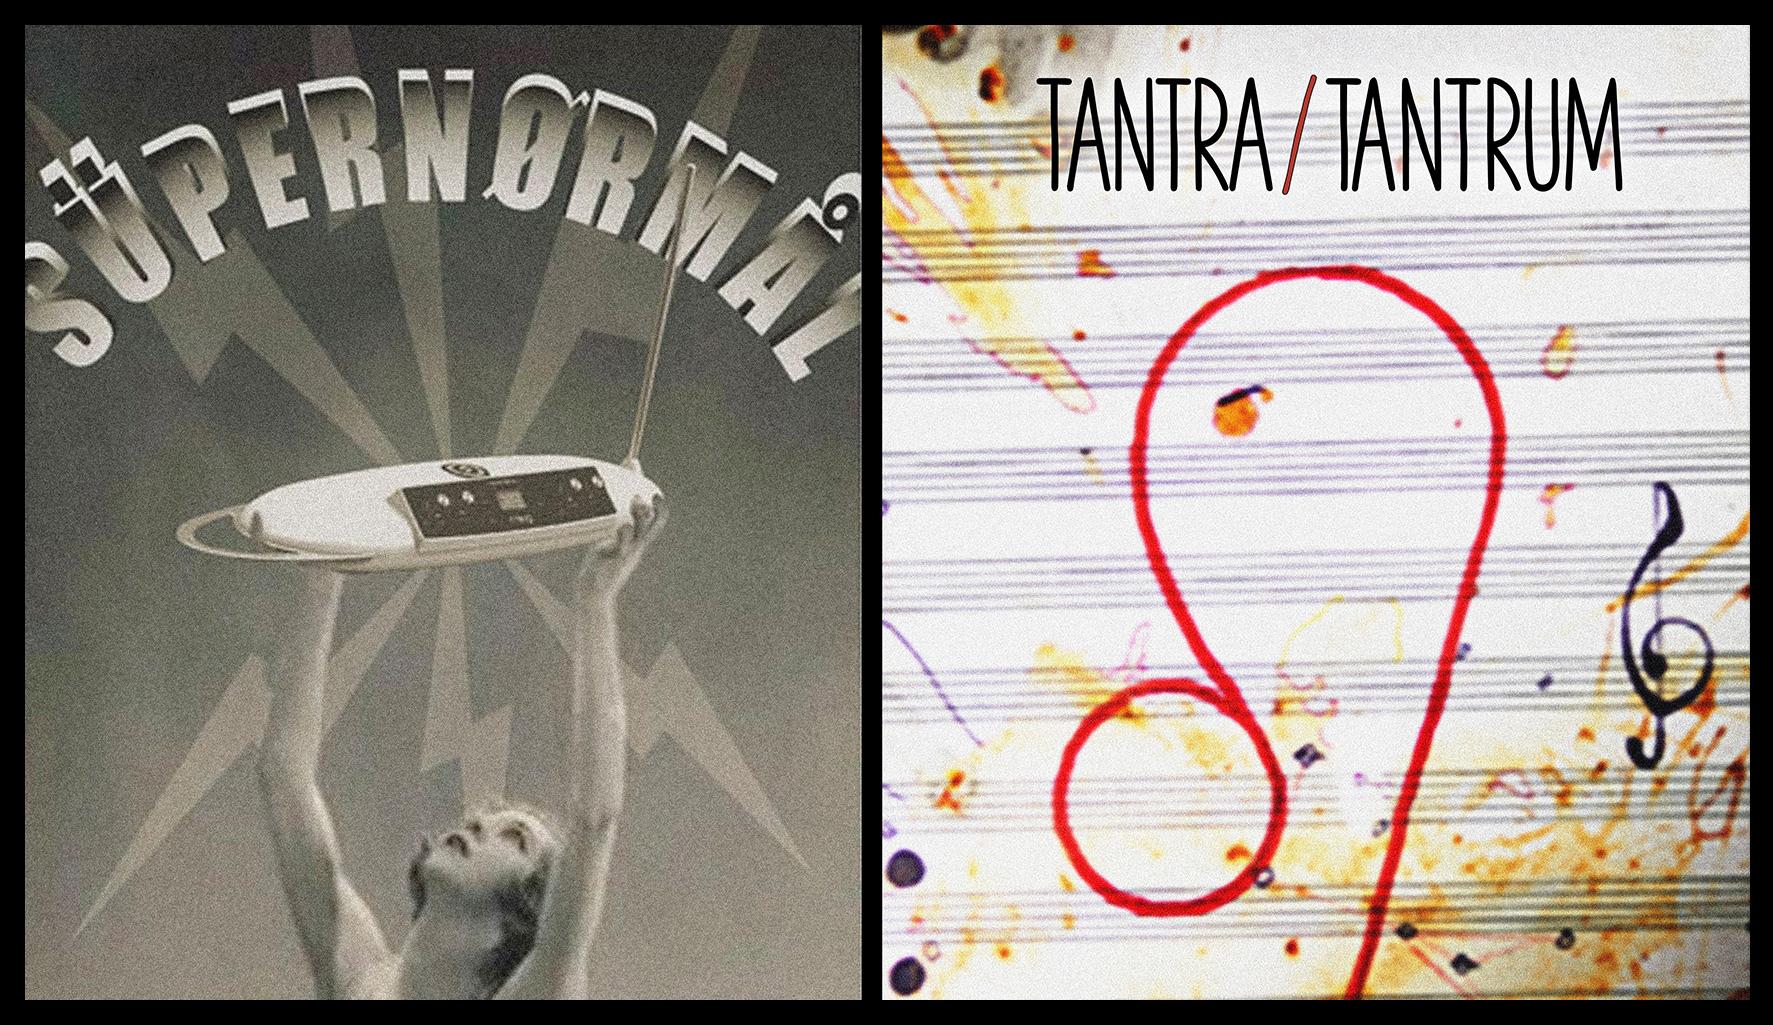 Supernormal with Tantra/Tantrum